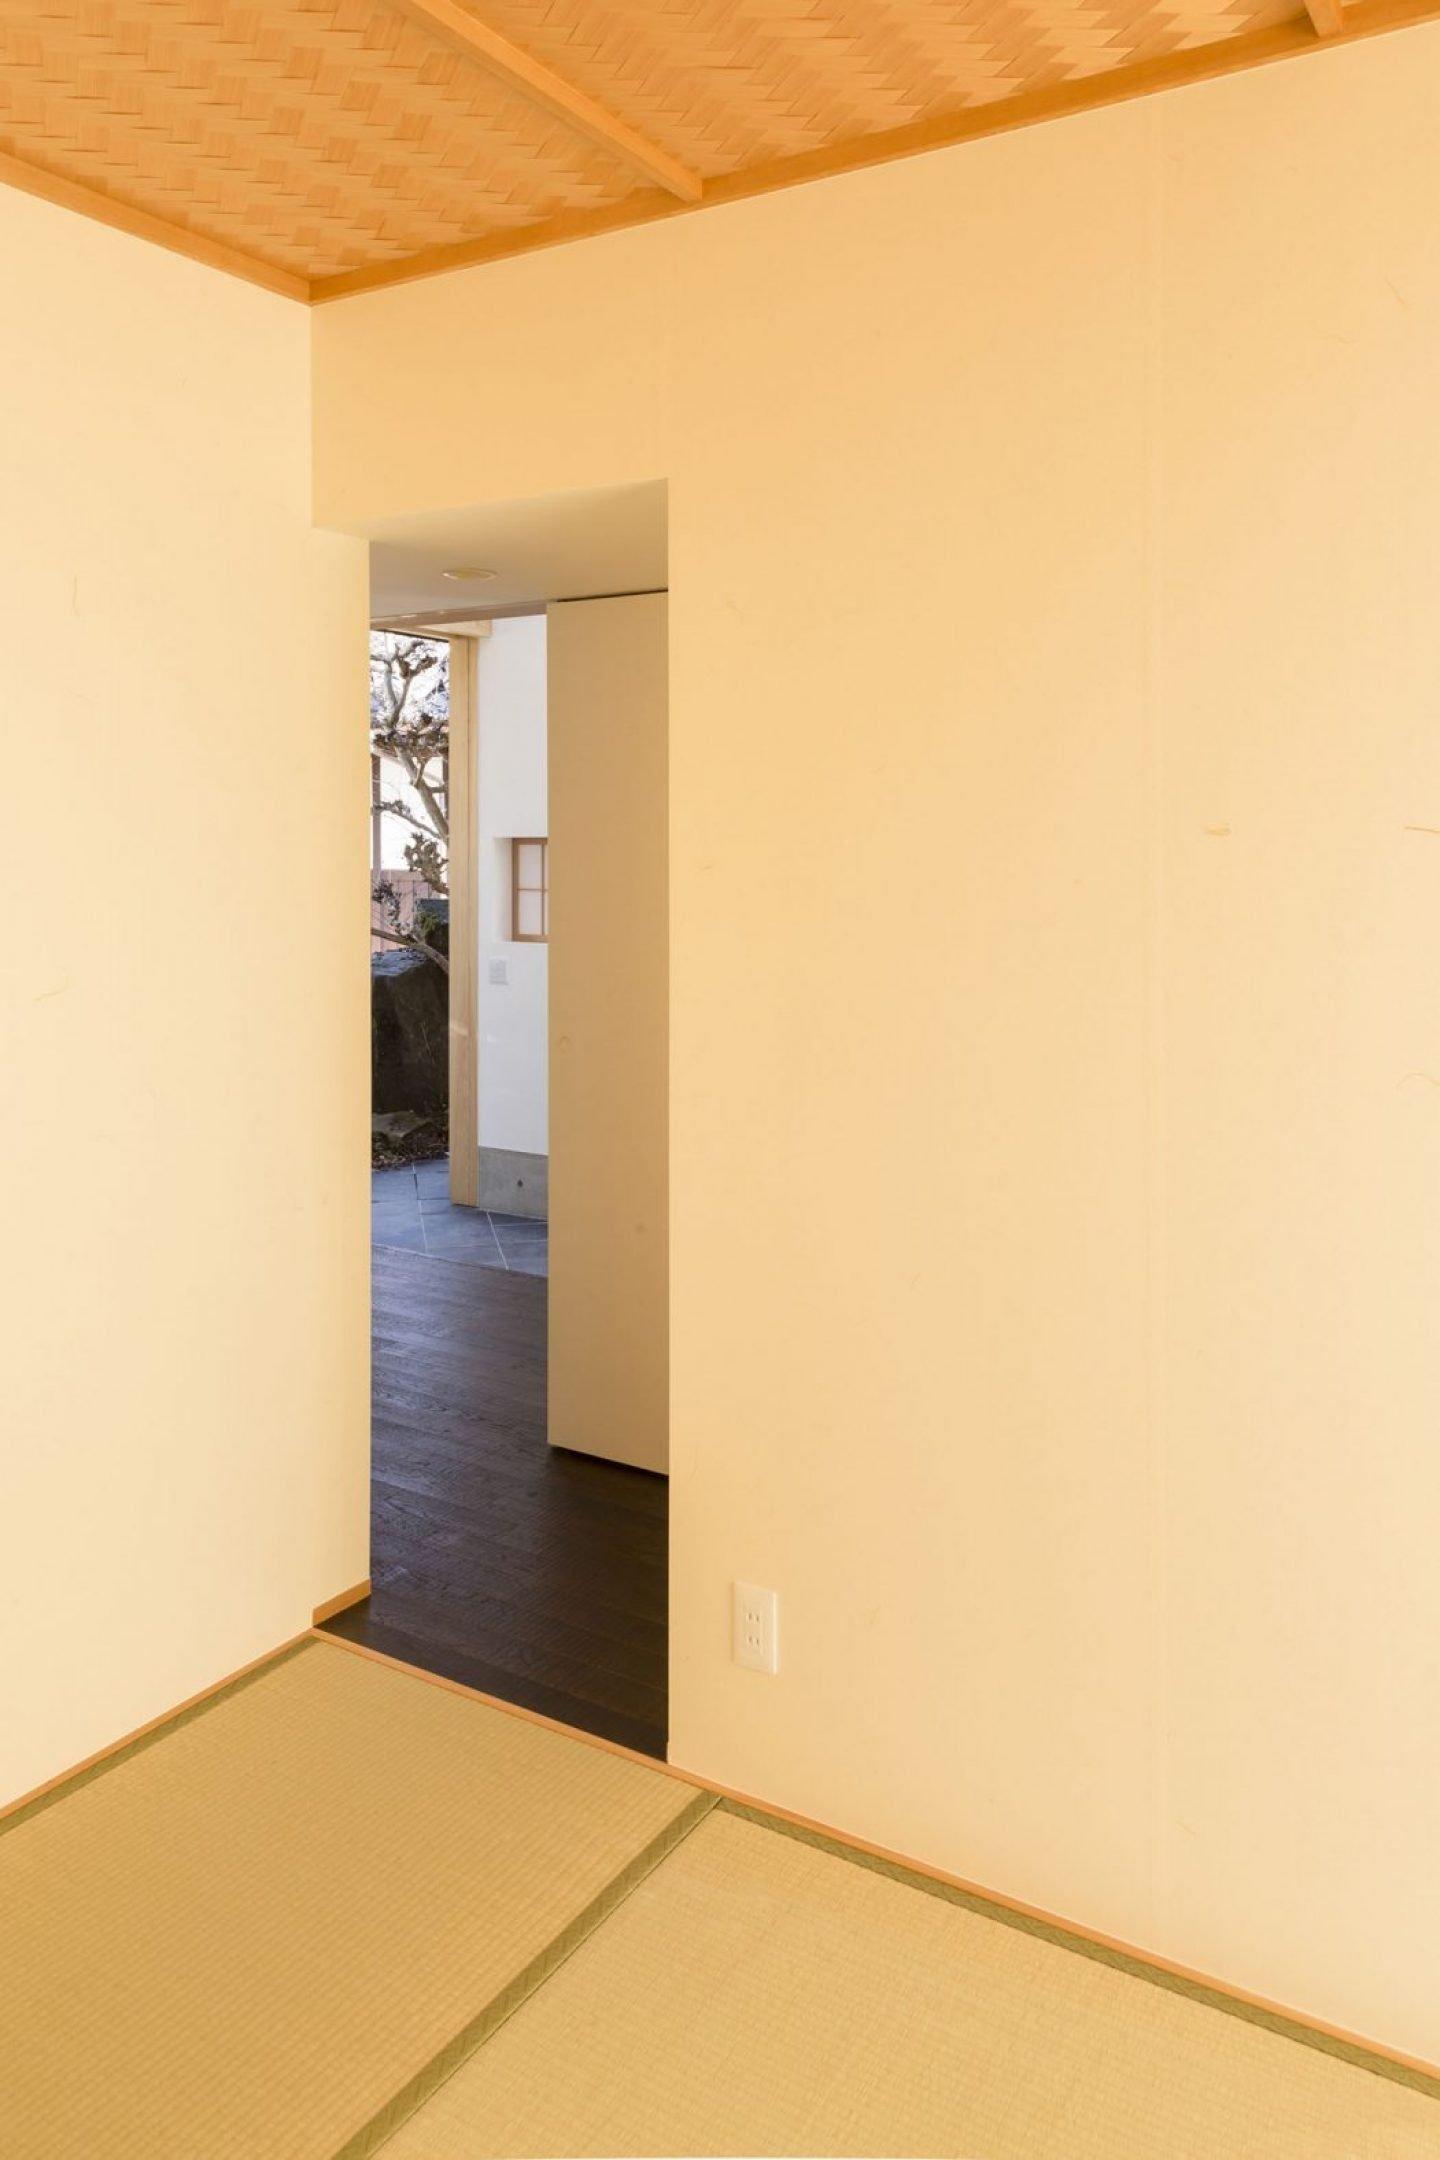 iGNANT_Architecture_Araki_Sasaski_Weekend_House_Kumano_12